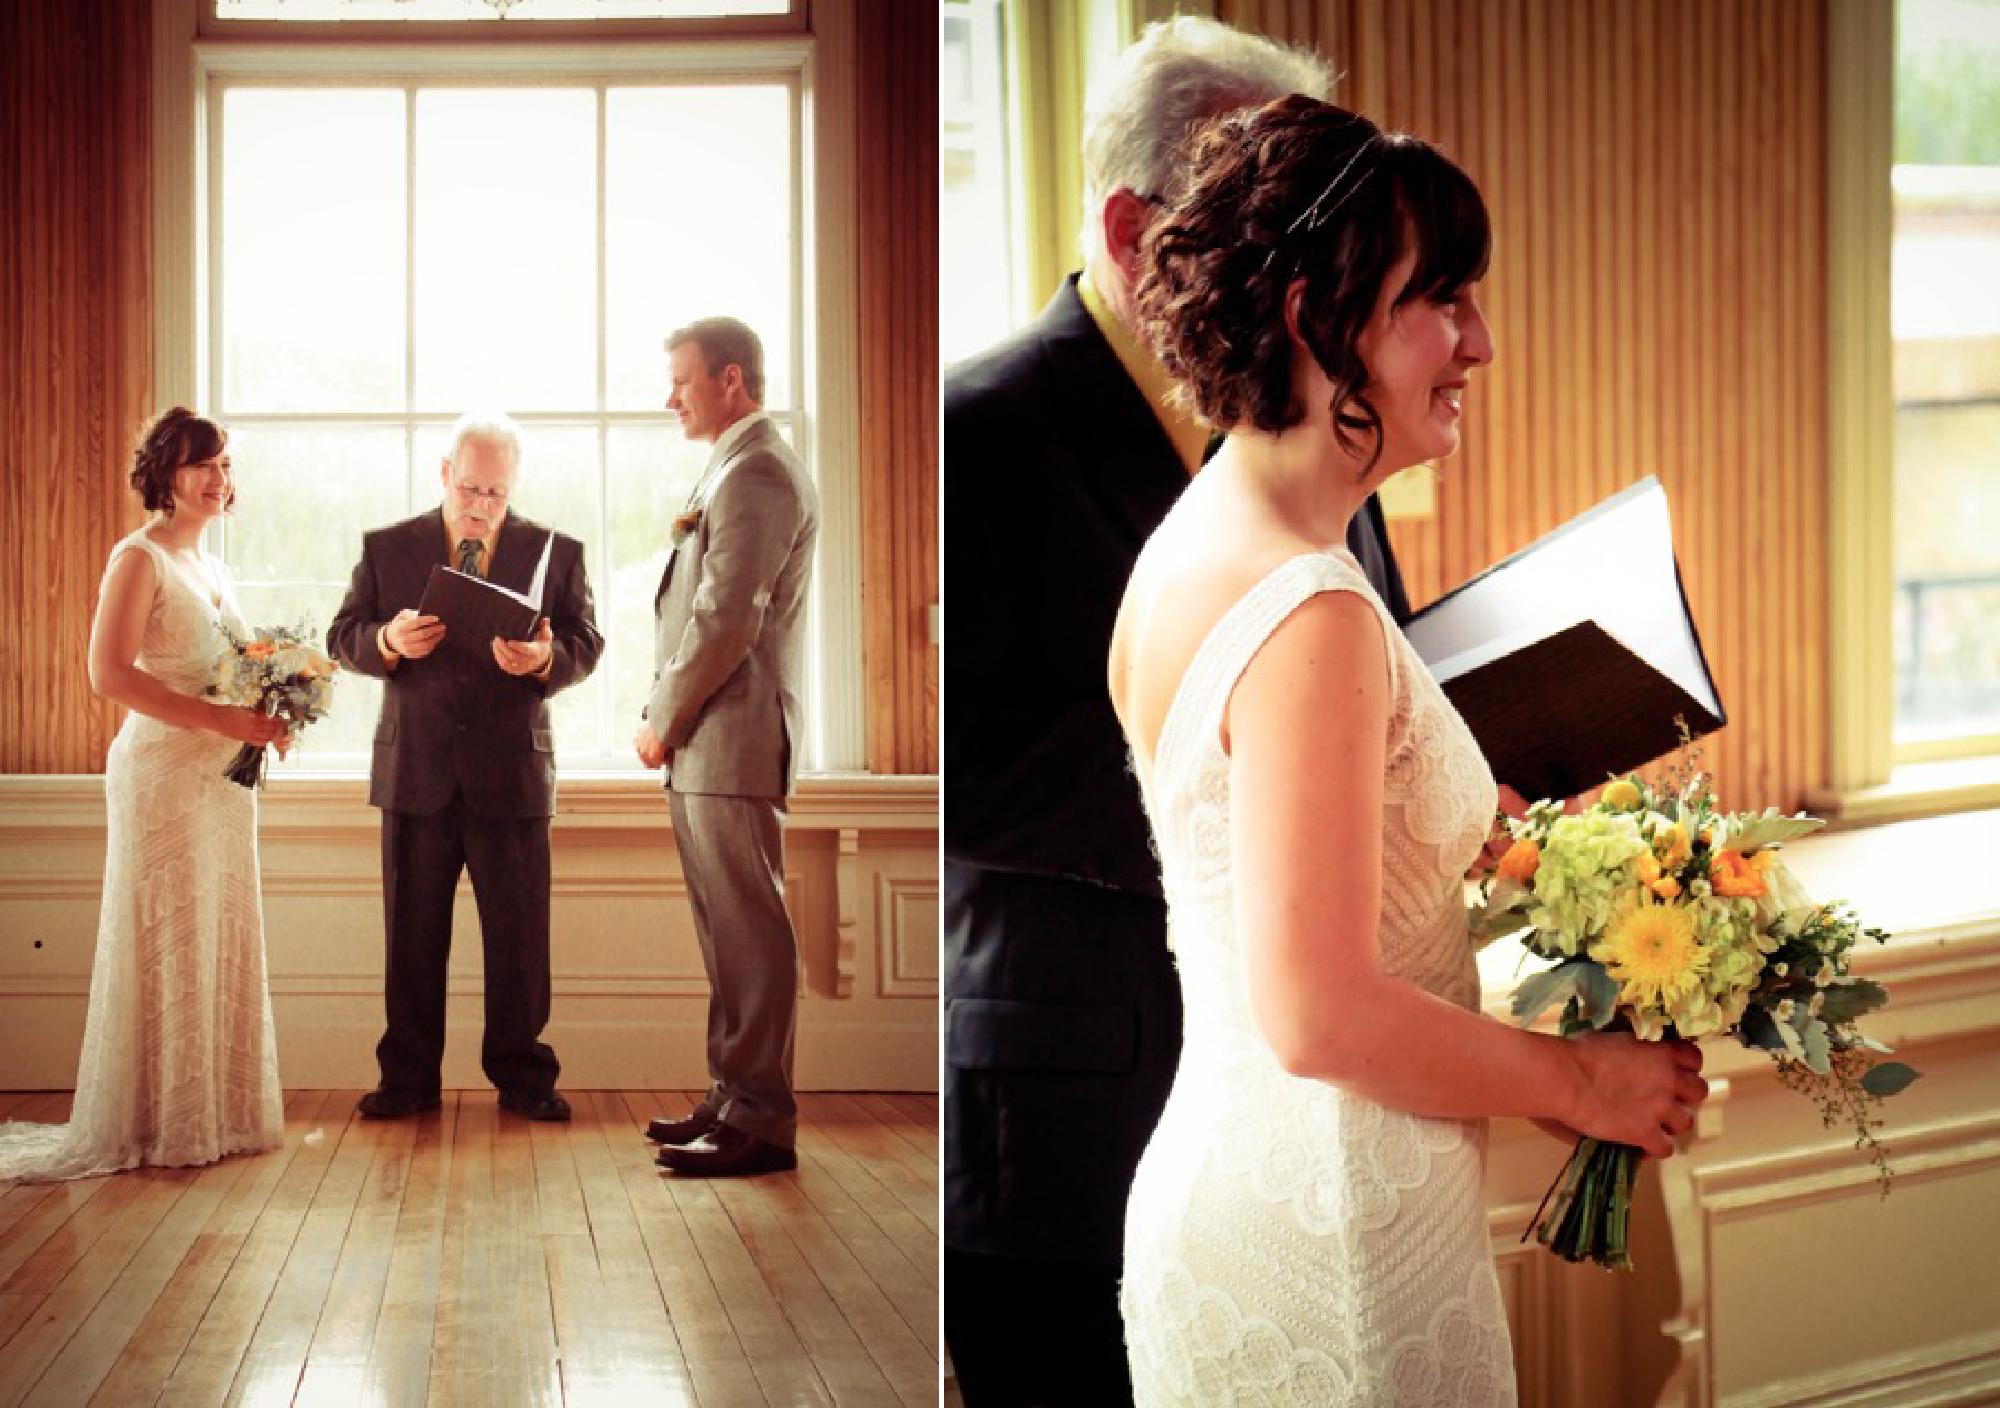 Kimberly_Eric_Mountain_Town_Wedding_3.jpeg